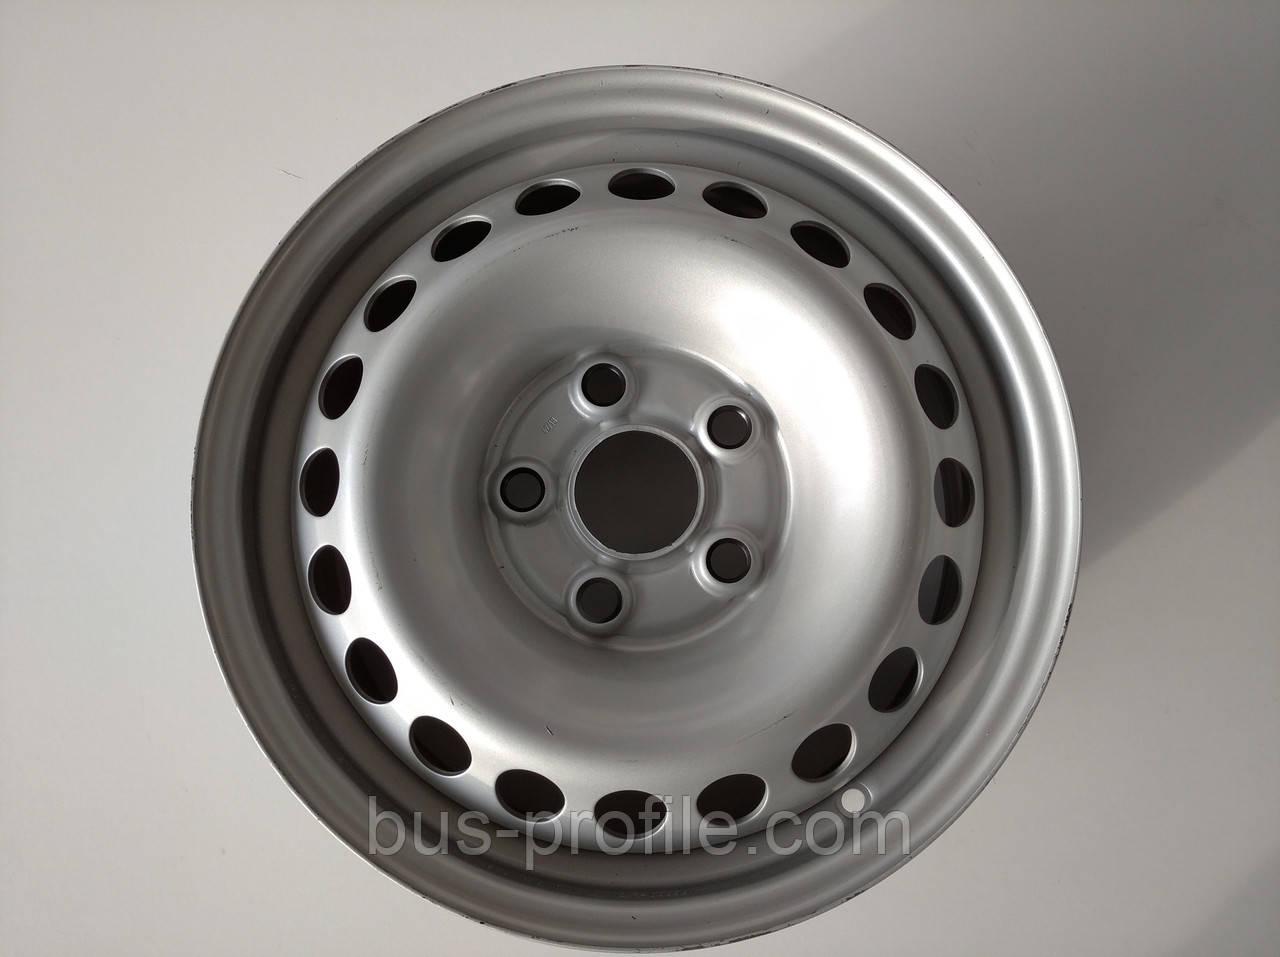 Диск колесный VW T5 03- (6.50Jx16 H2; 5x120x65; ET51) — KRONPRINZ — VO616016